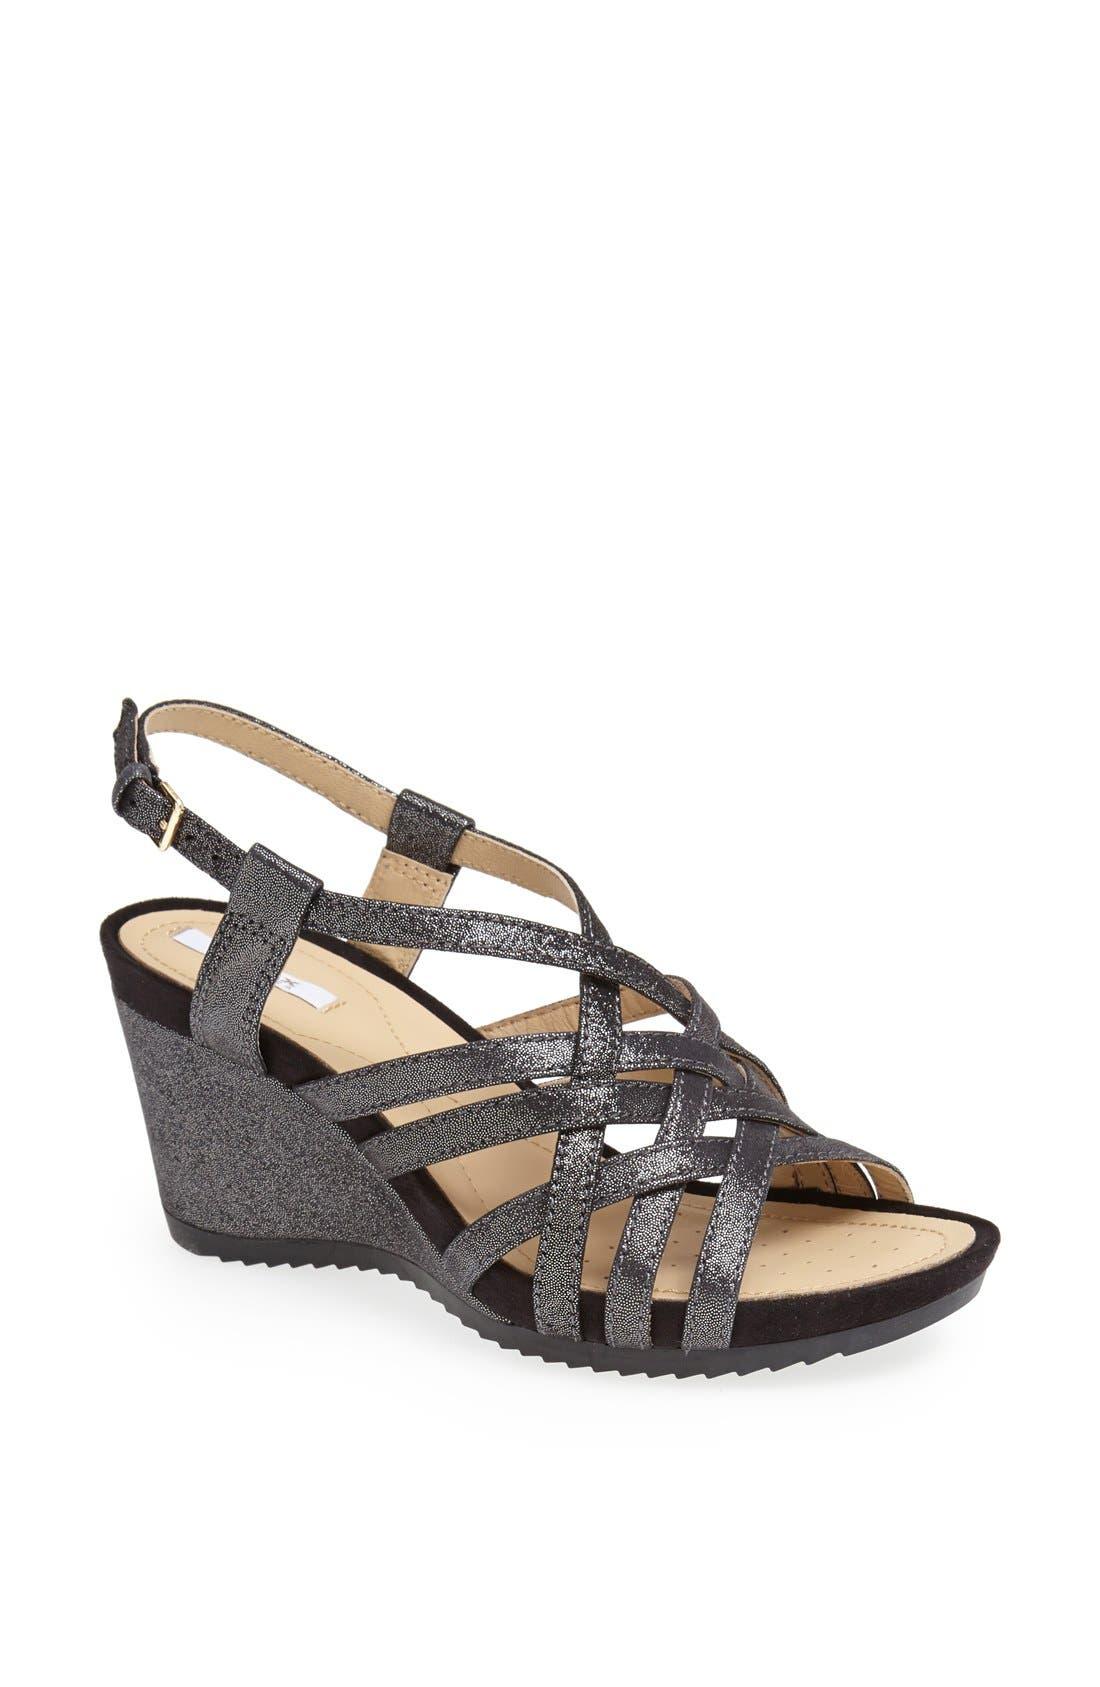 Alternate Image 1 Selected - Geox 'Roxy' Metallic Leather Sandal (Women)